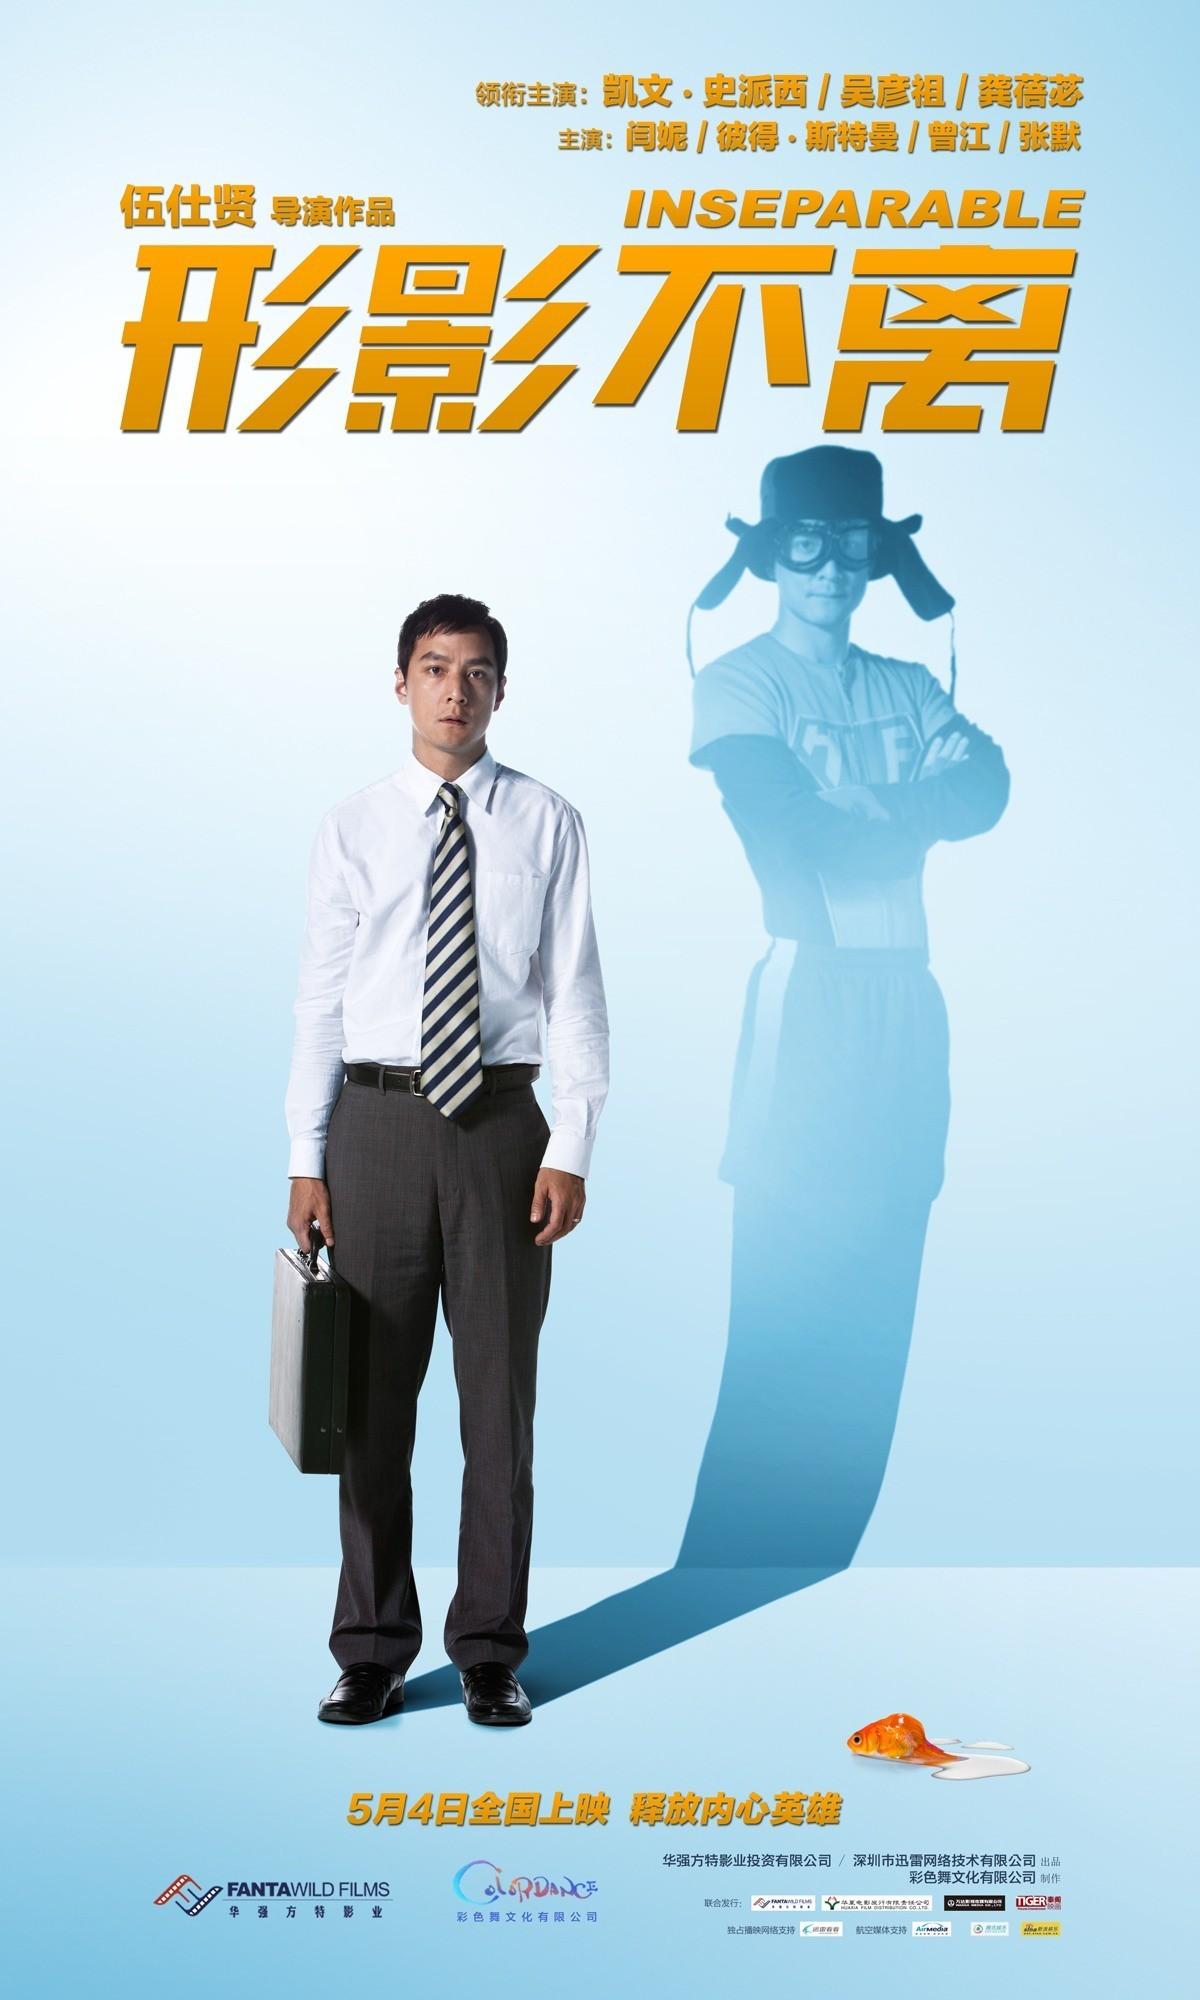 плакат фильма характер-постер Неразлучные*